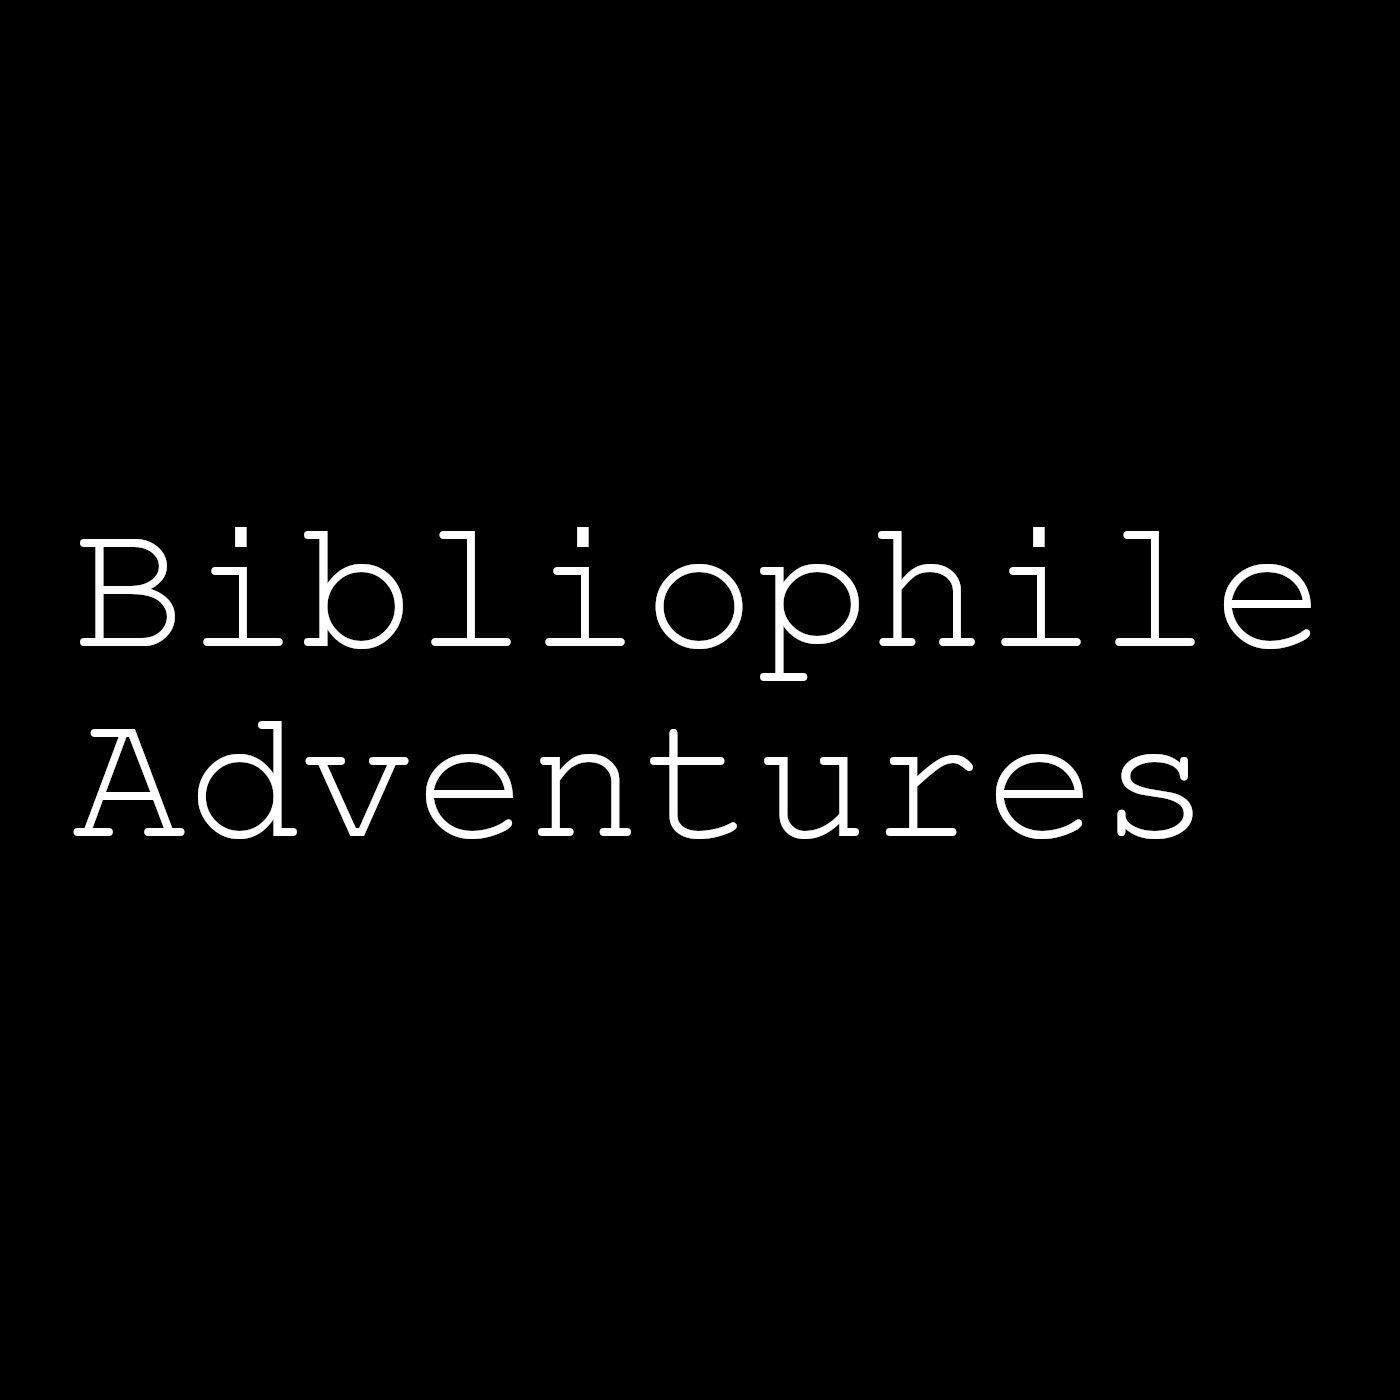 Bibliophile Adventures